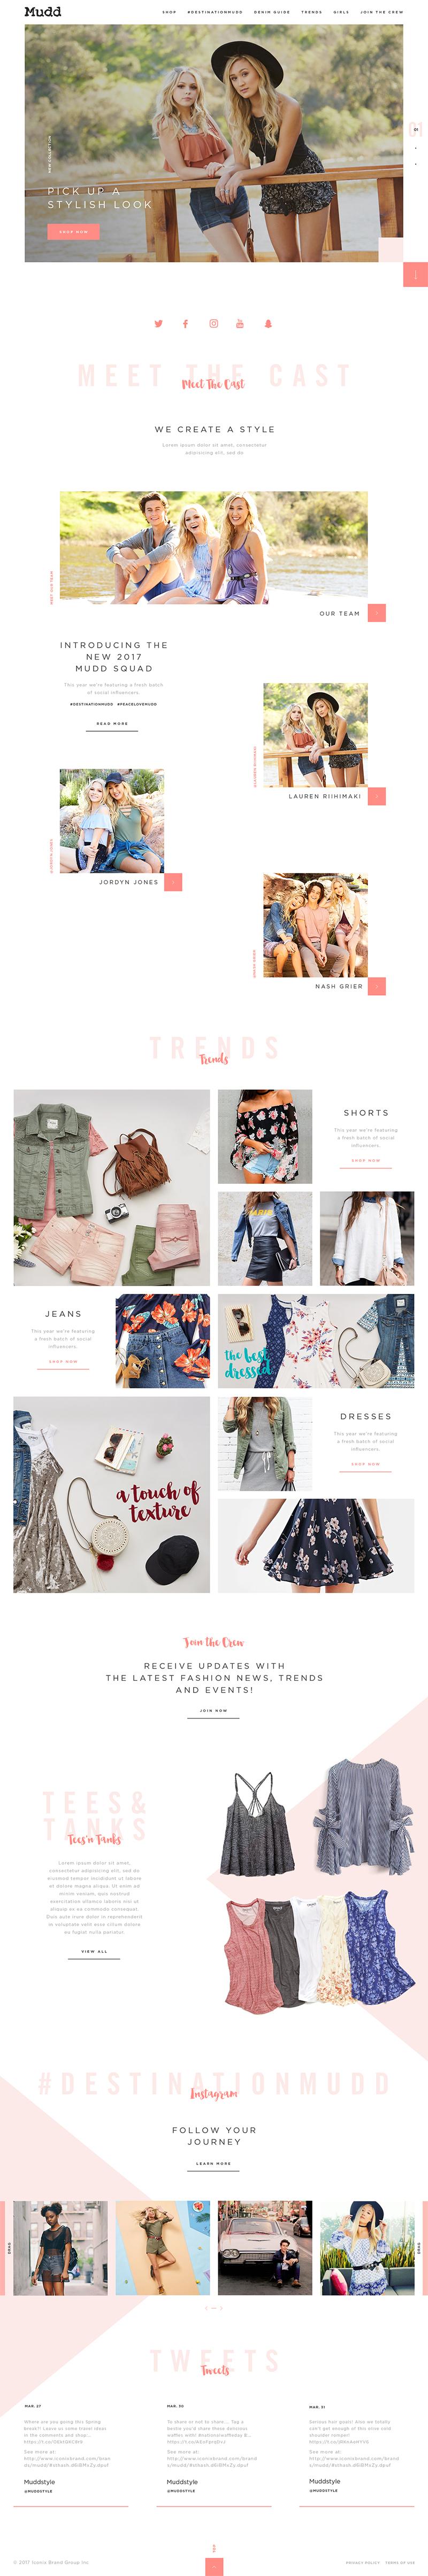 Mudd Jeans Web Design